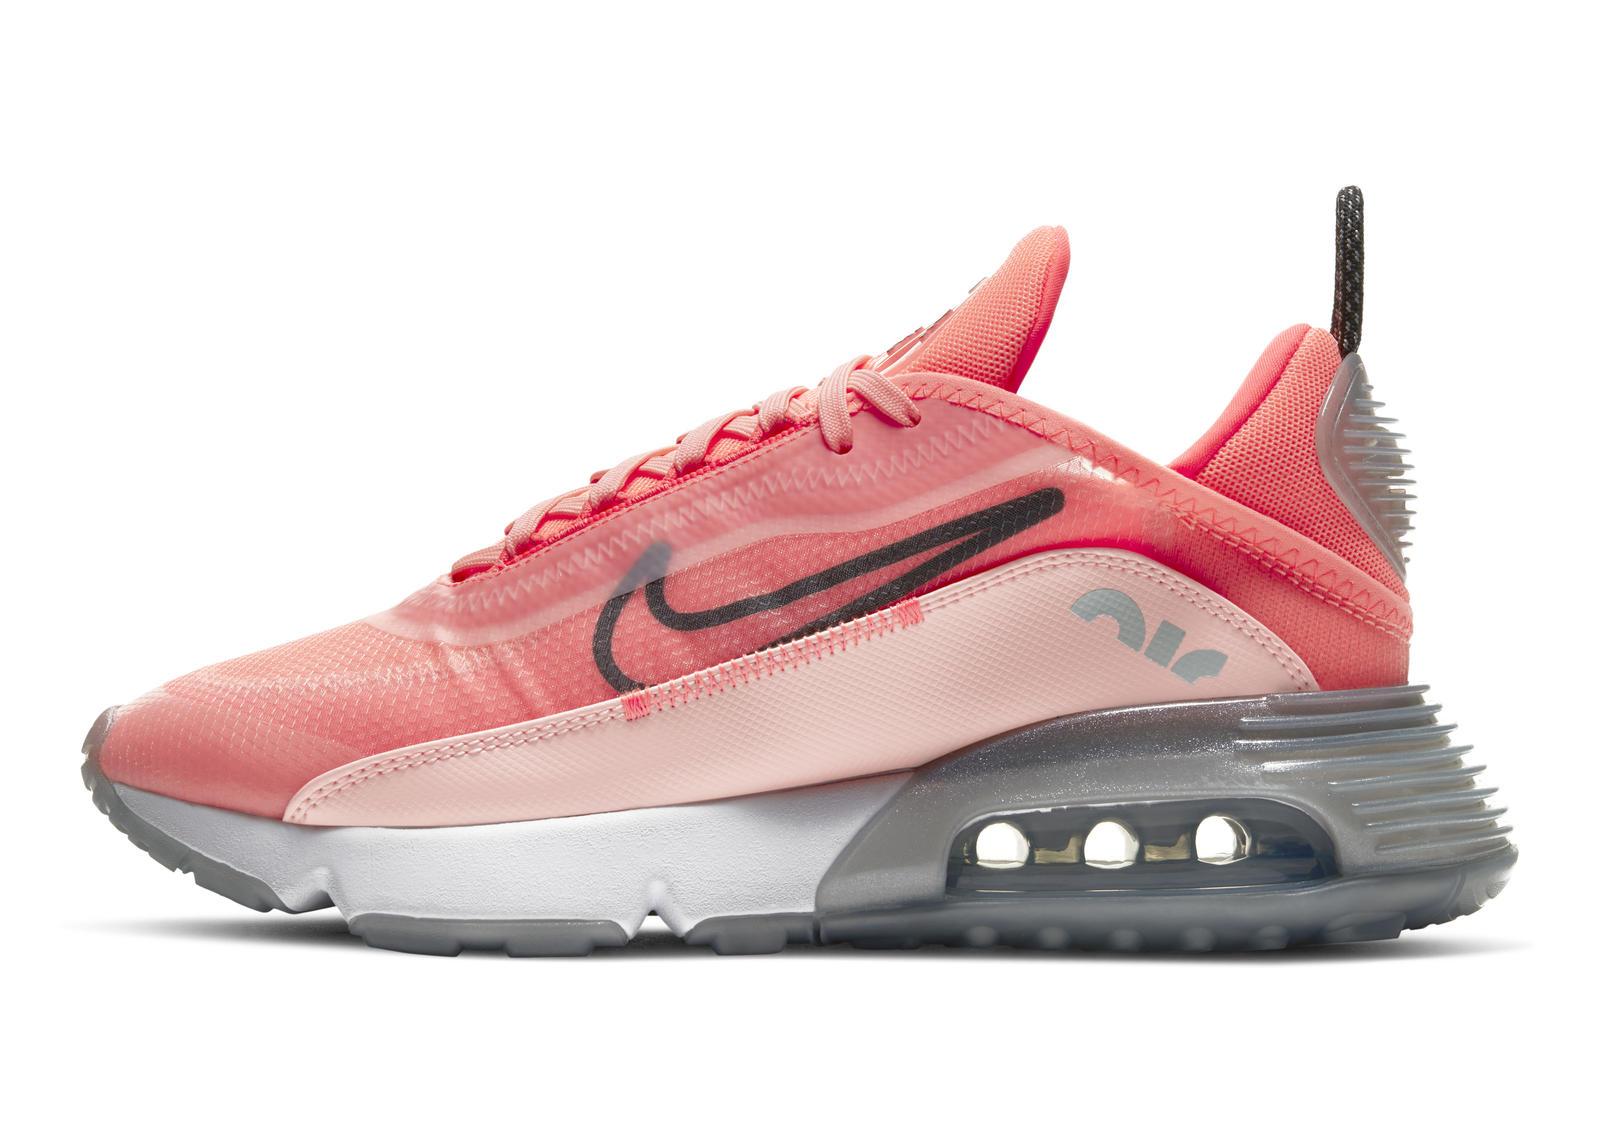 Nike onthult zeven nieuwe sneakers voor Air Max Day 2020